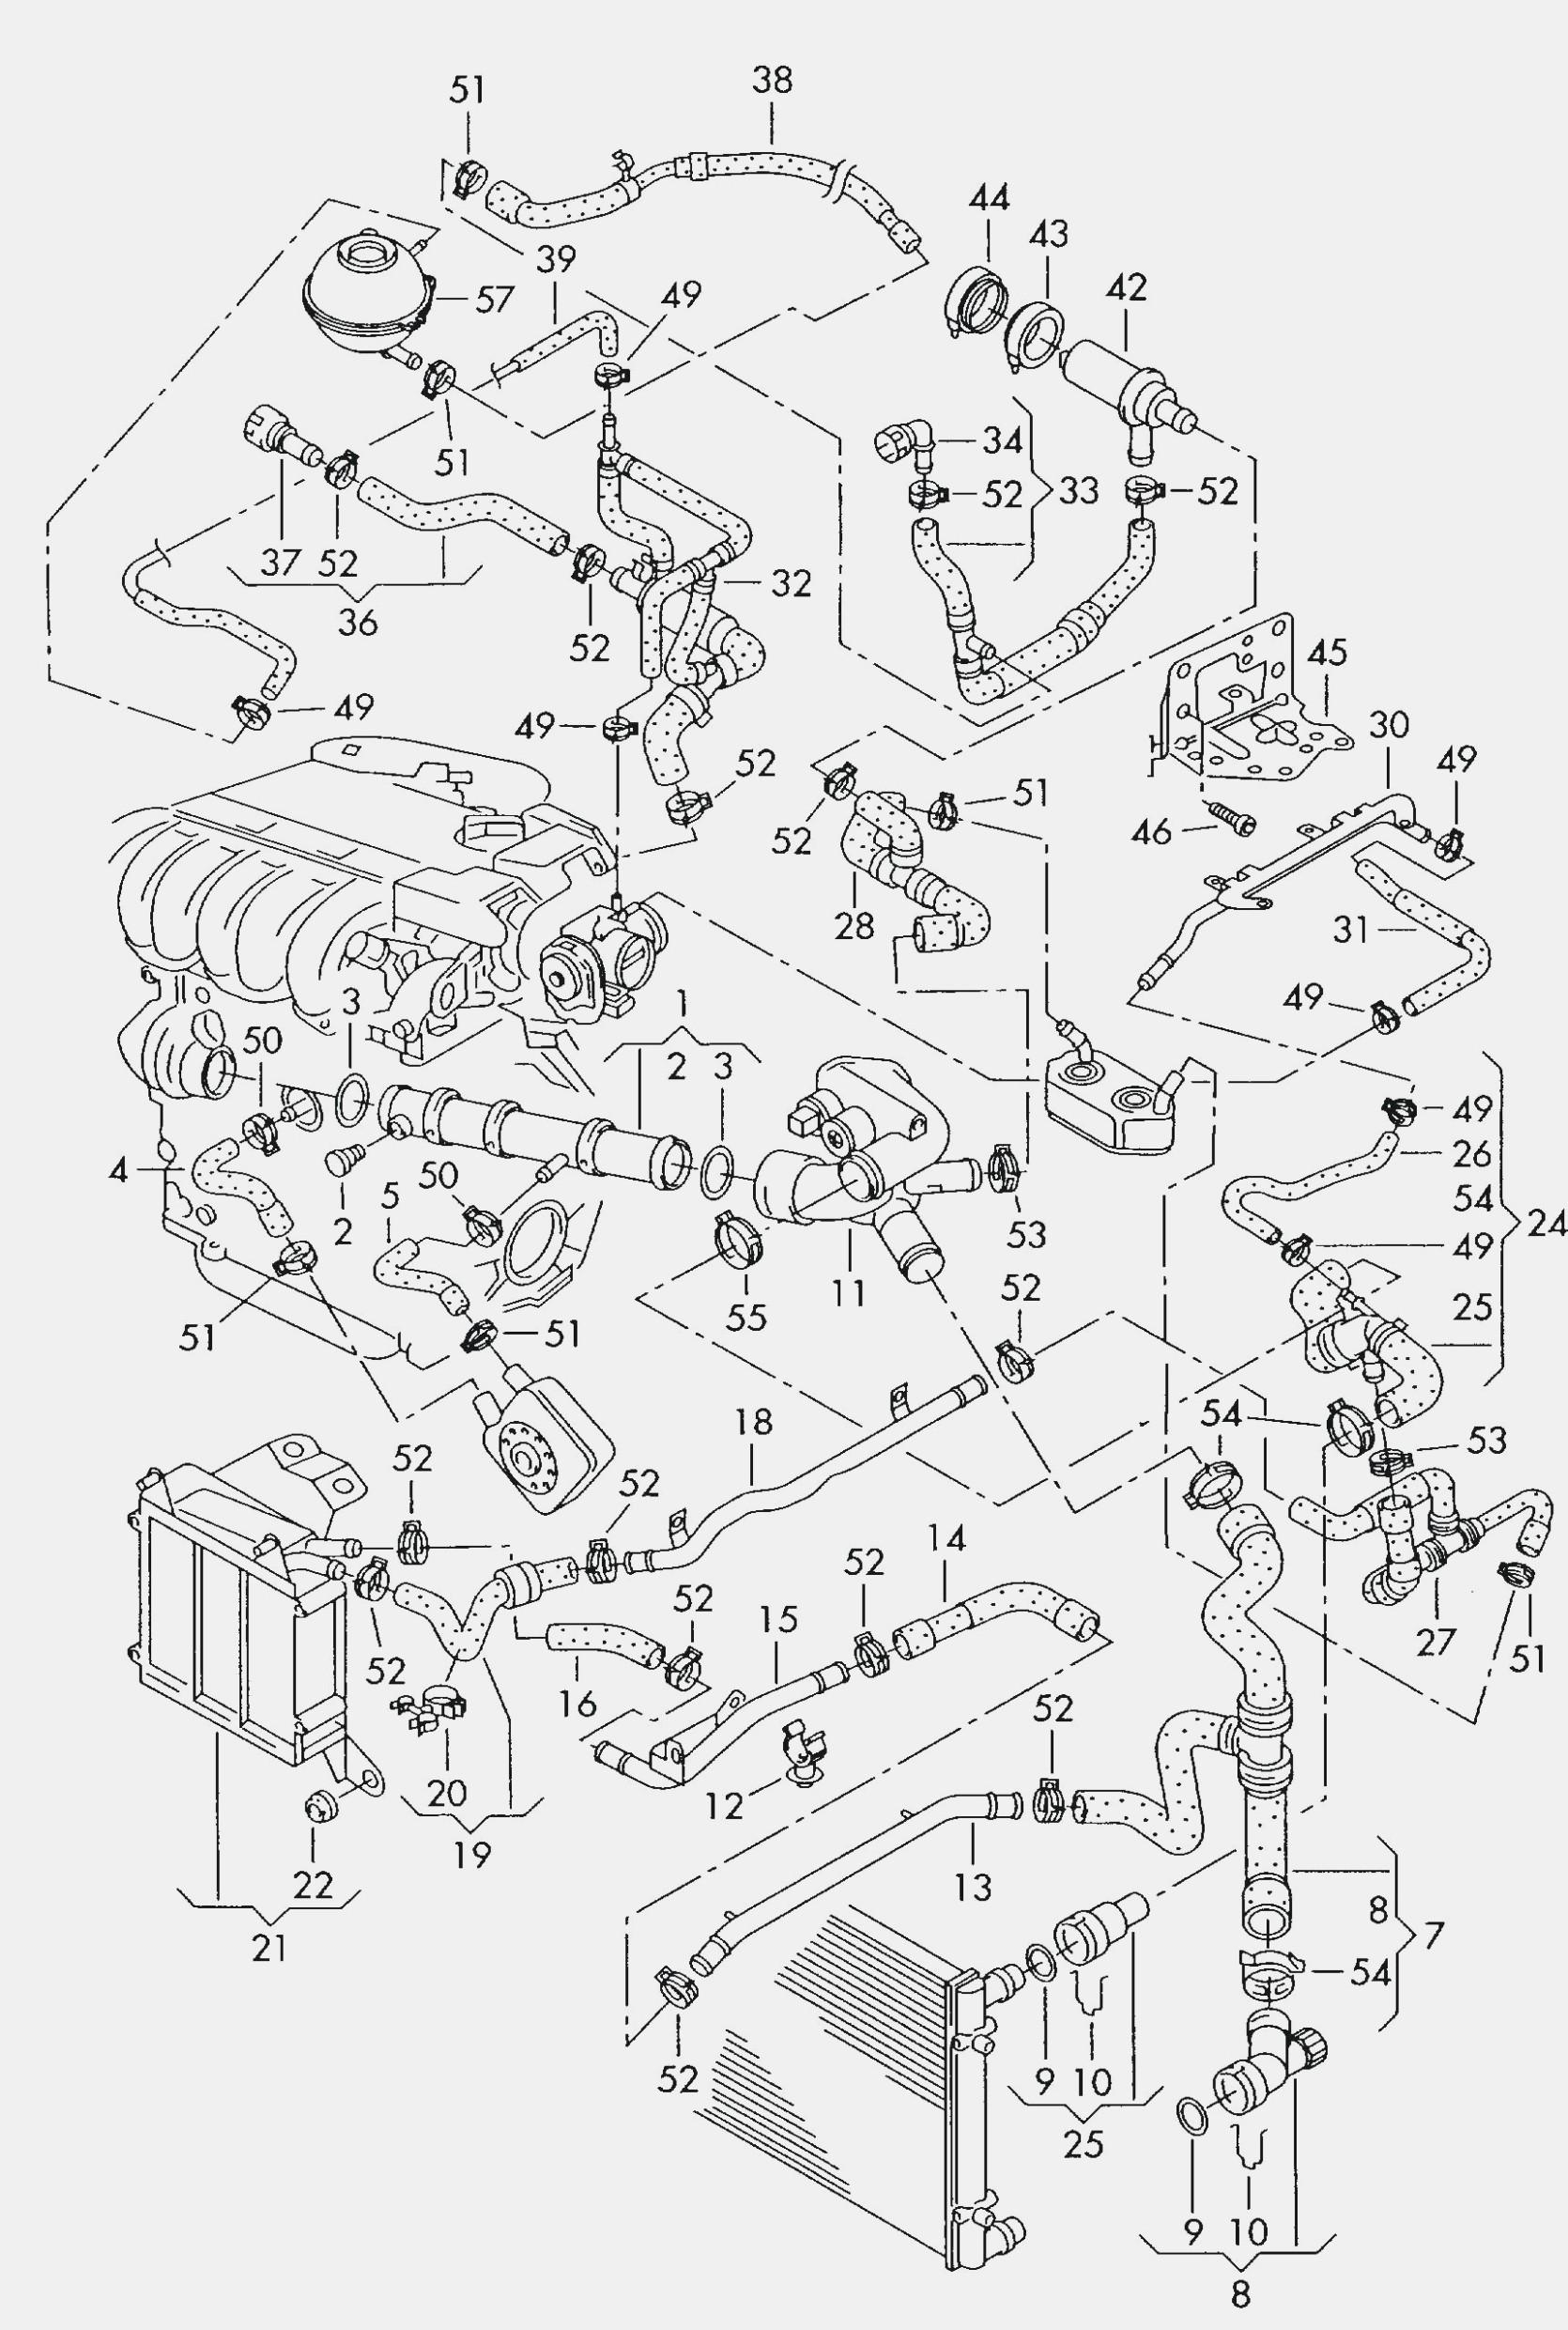 2006 Vw Passat Engine Diagram 95 Vw 2 0 Jetta Engine Diagram Wiring Diagram New Of 2006 Vw Passat Engine Diagram